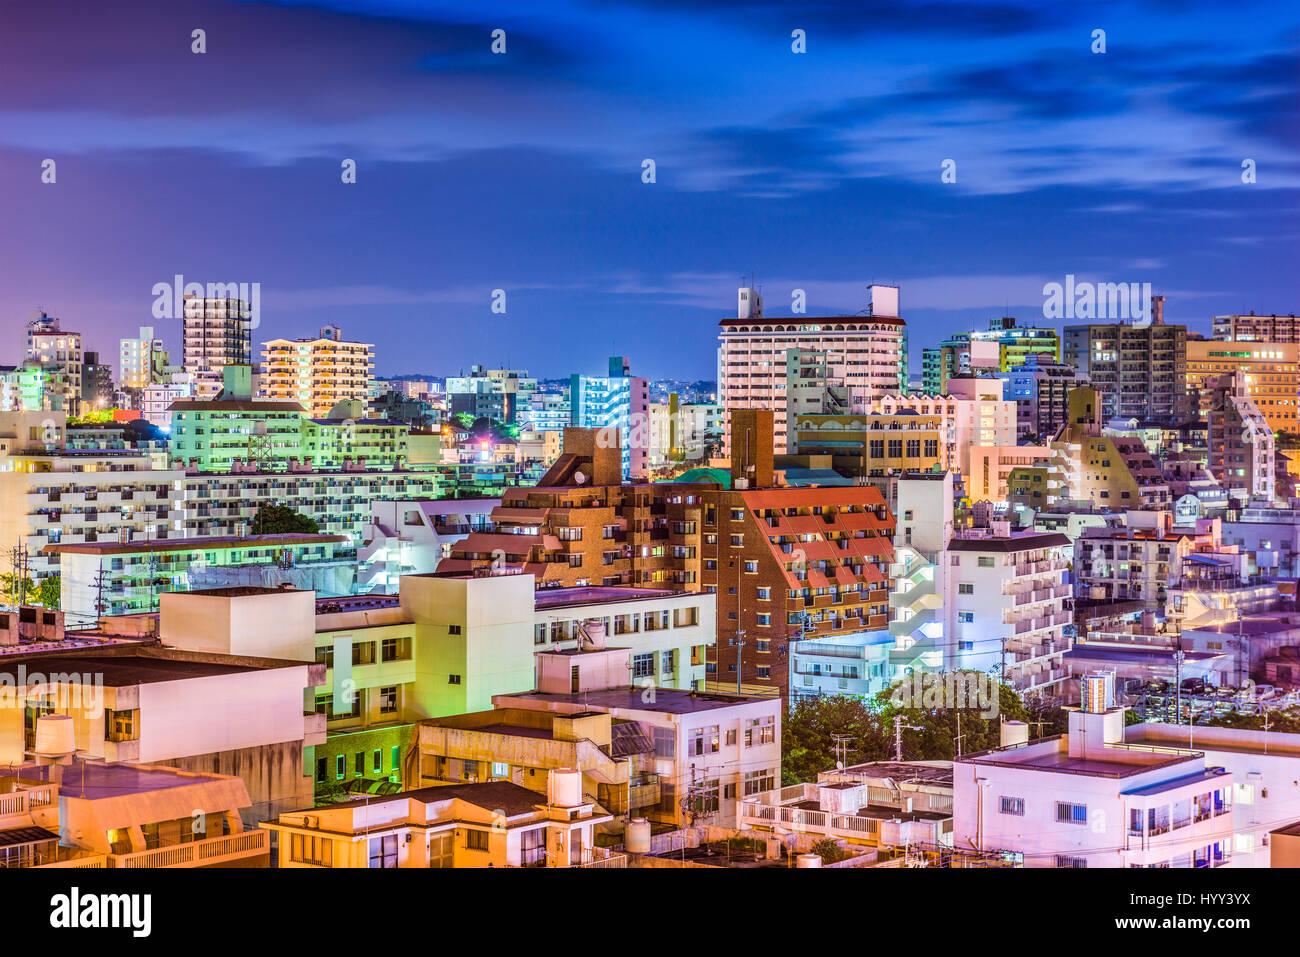 Naha, Okinawa, Japan downtown skyline at night. - Stock Image